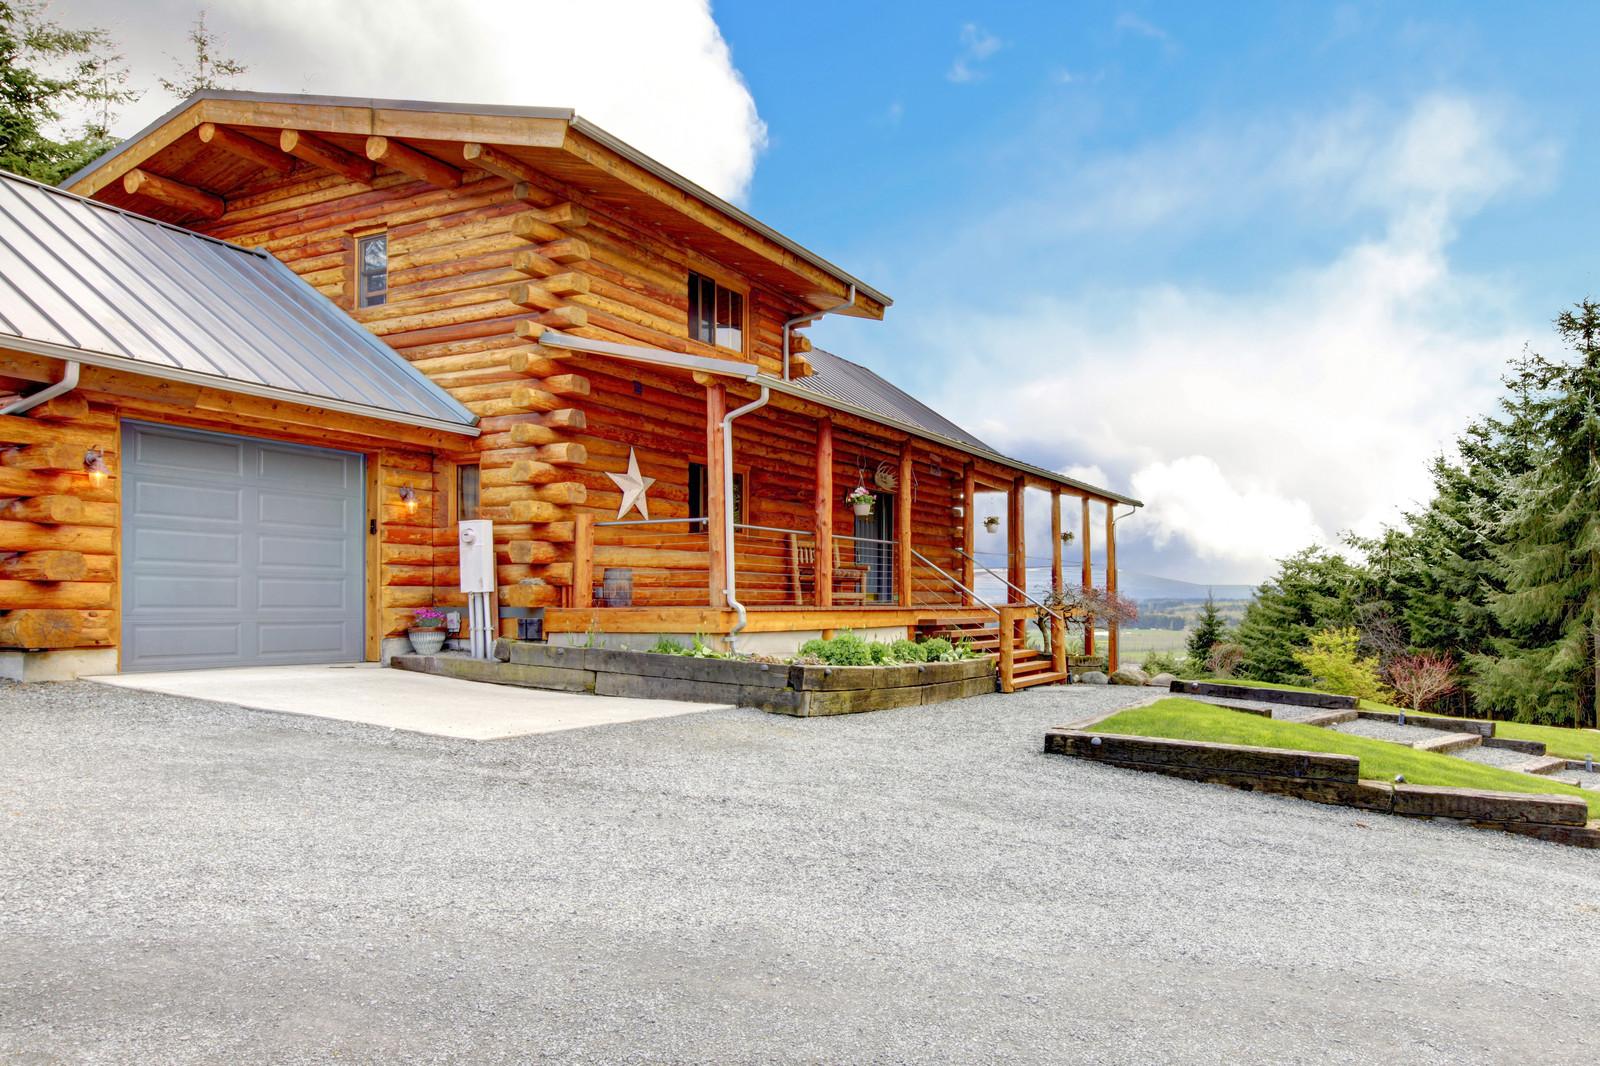 Estacada Oregon Homes for Sale